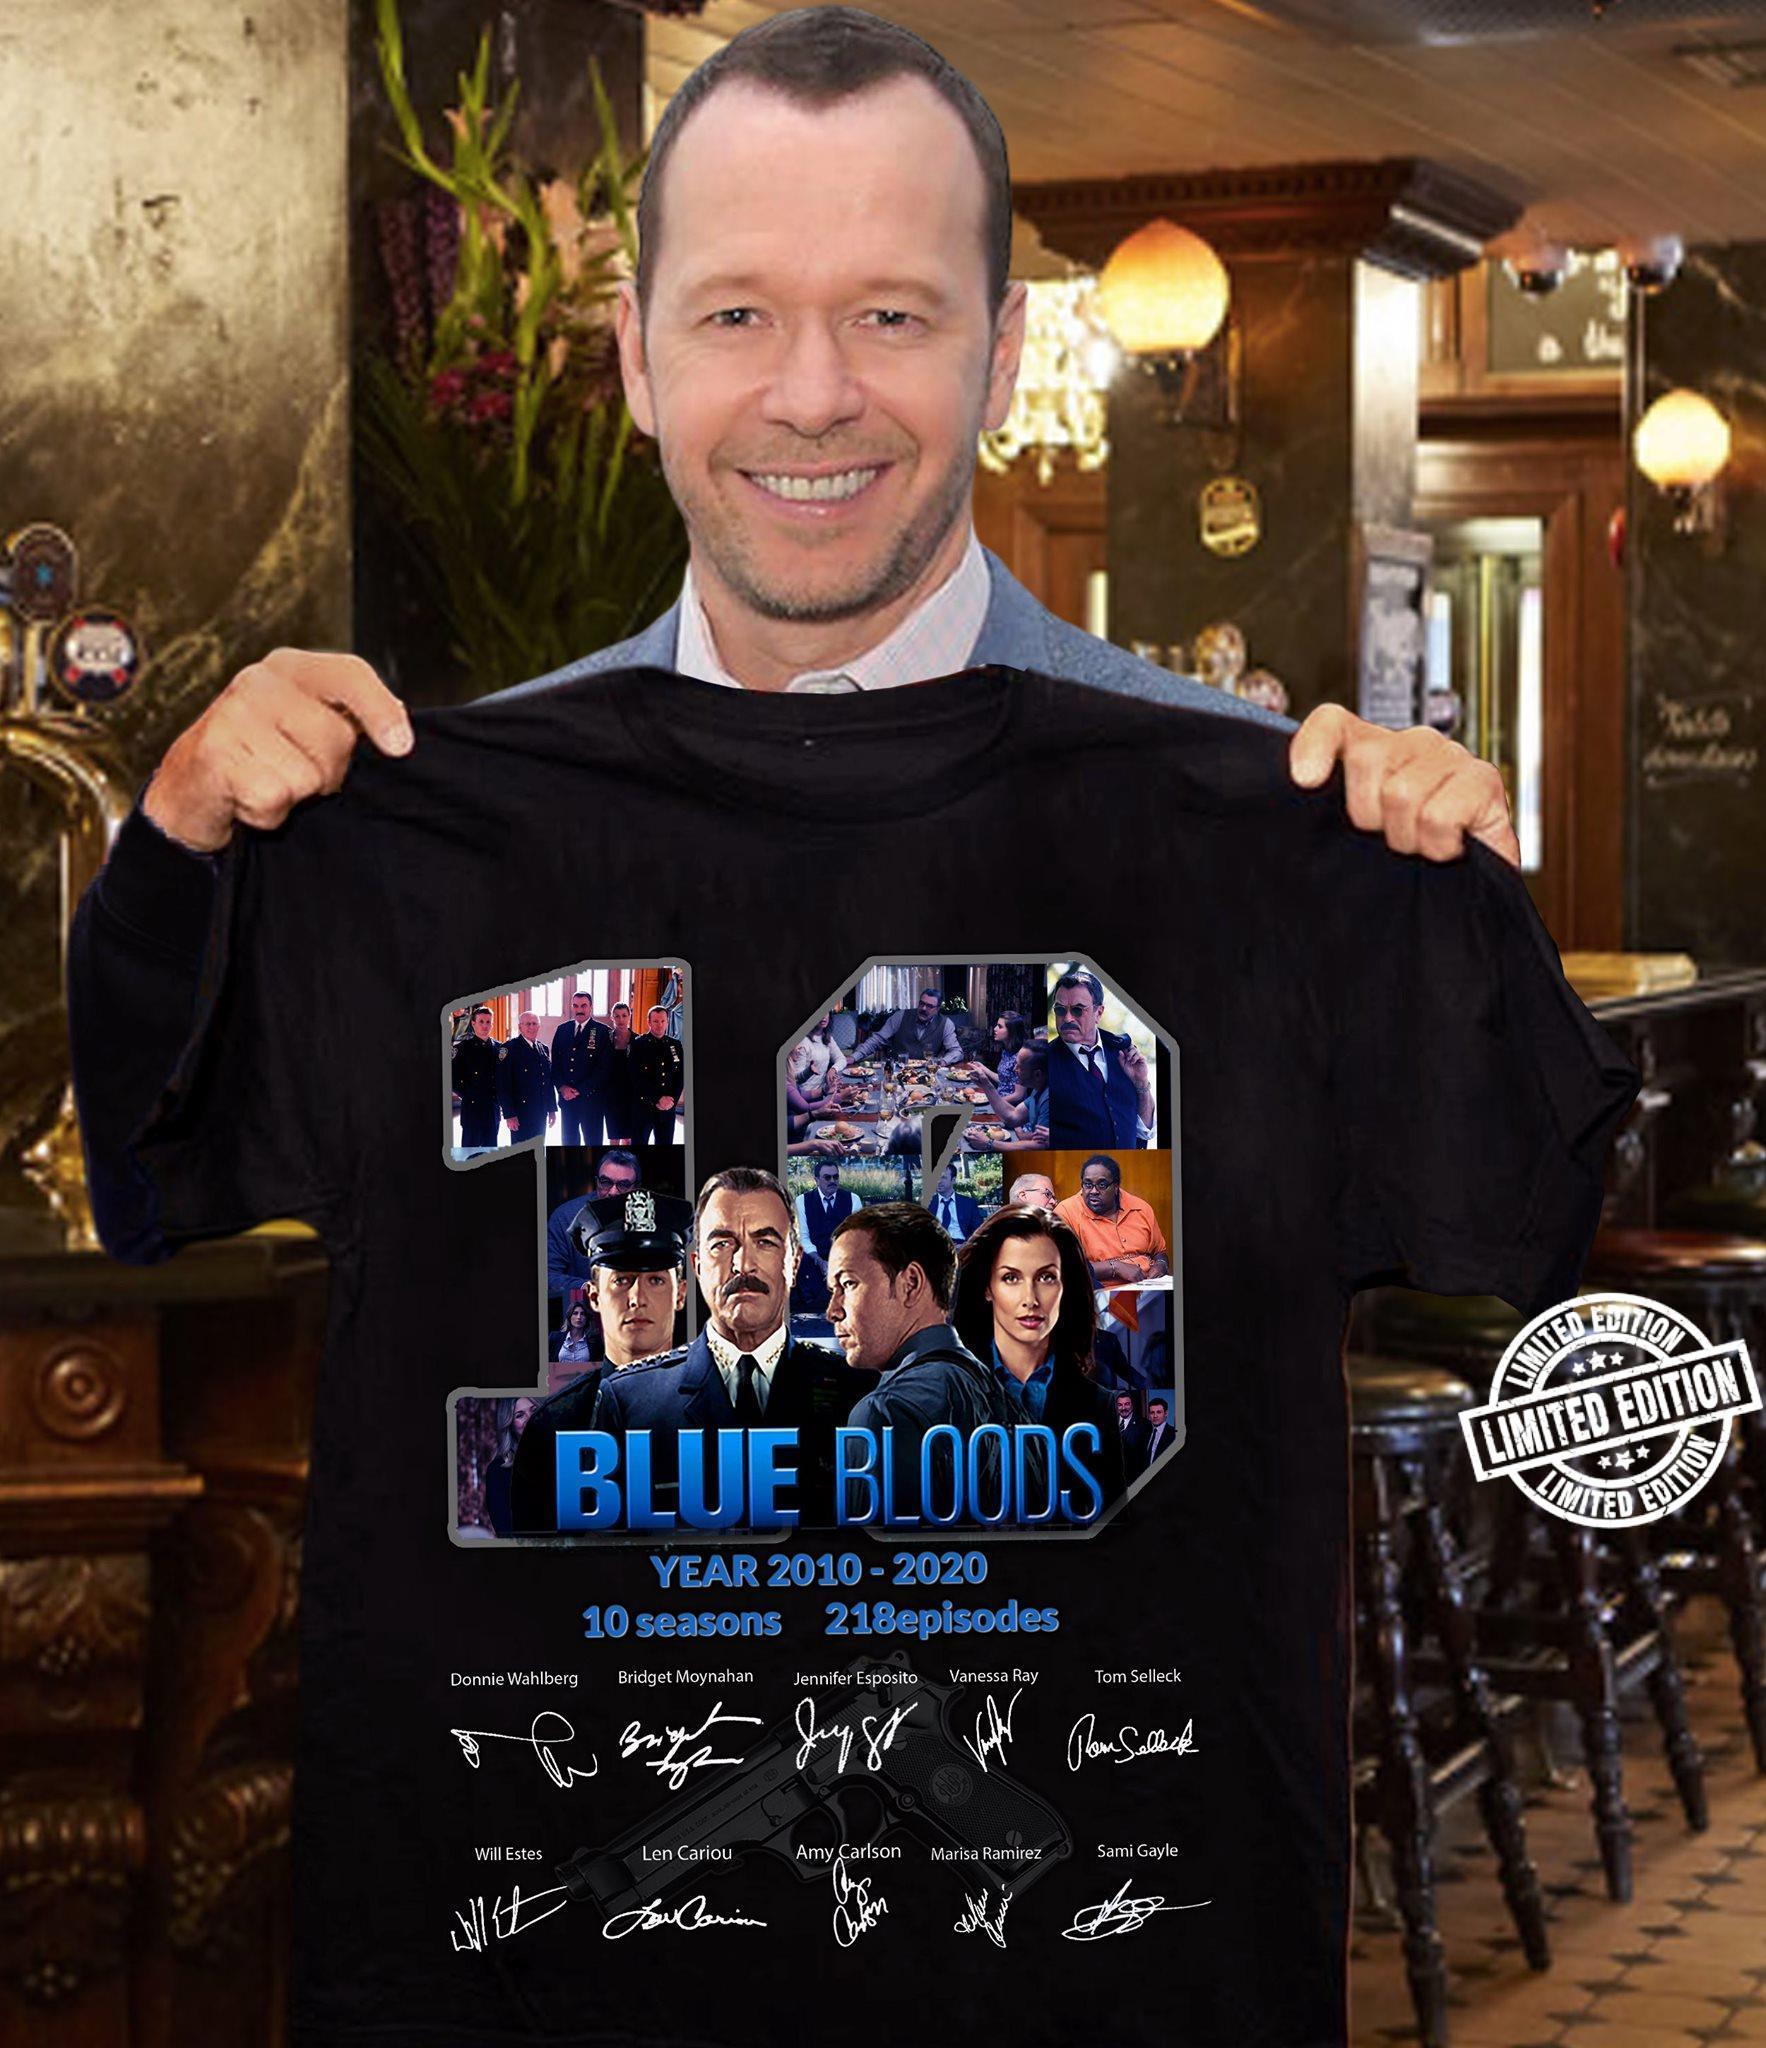 Blue bloods 10 year 2010 - 2020 10 seasons 218 episodes shirt